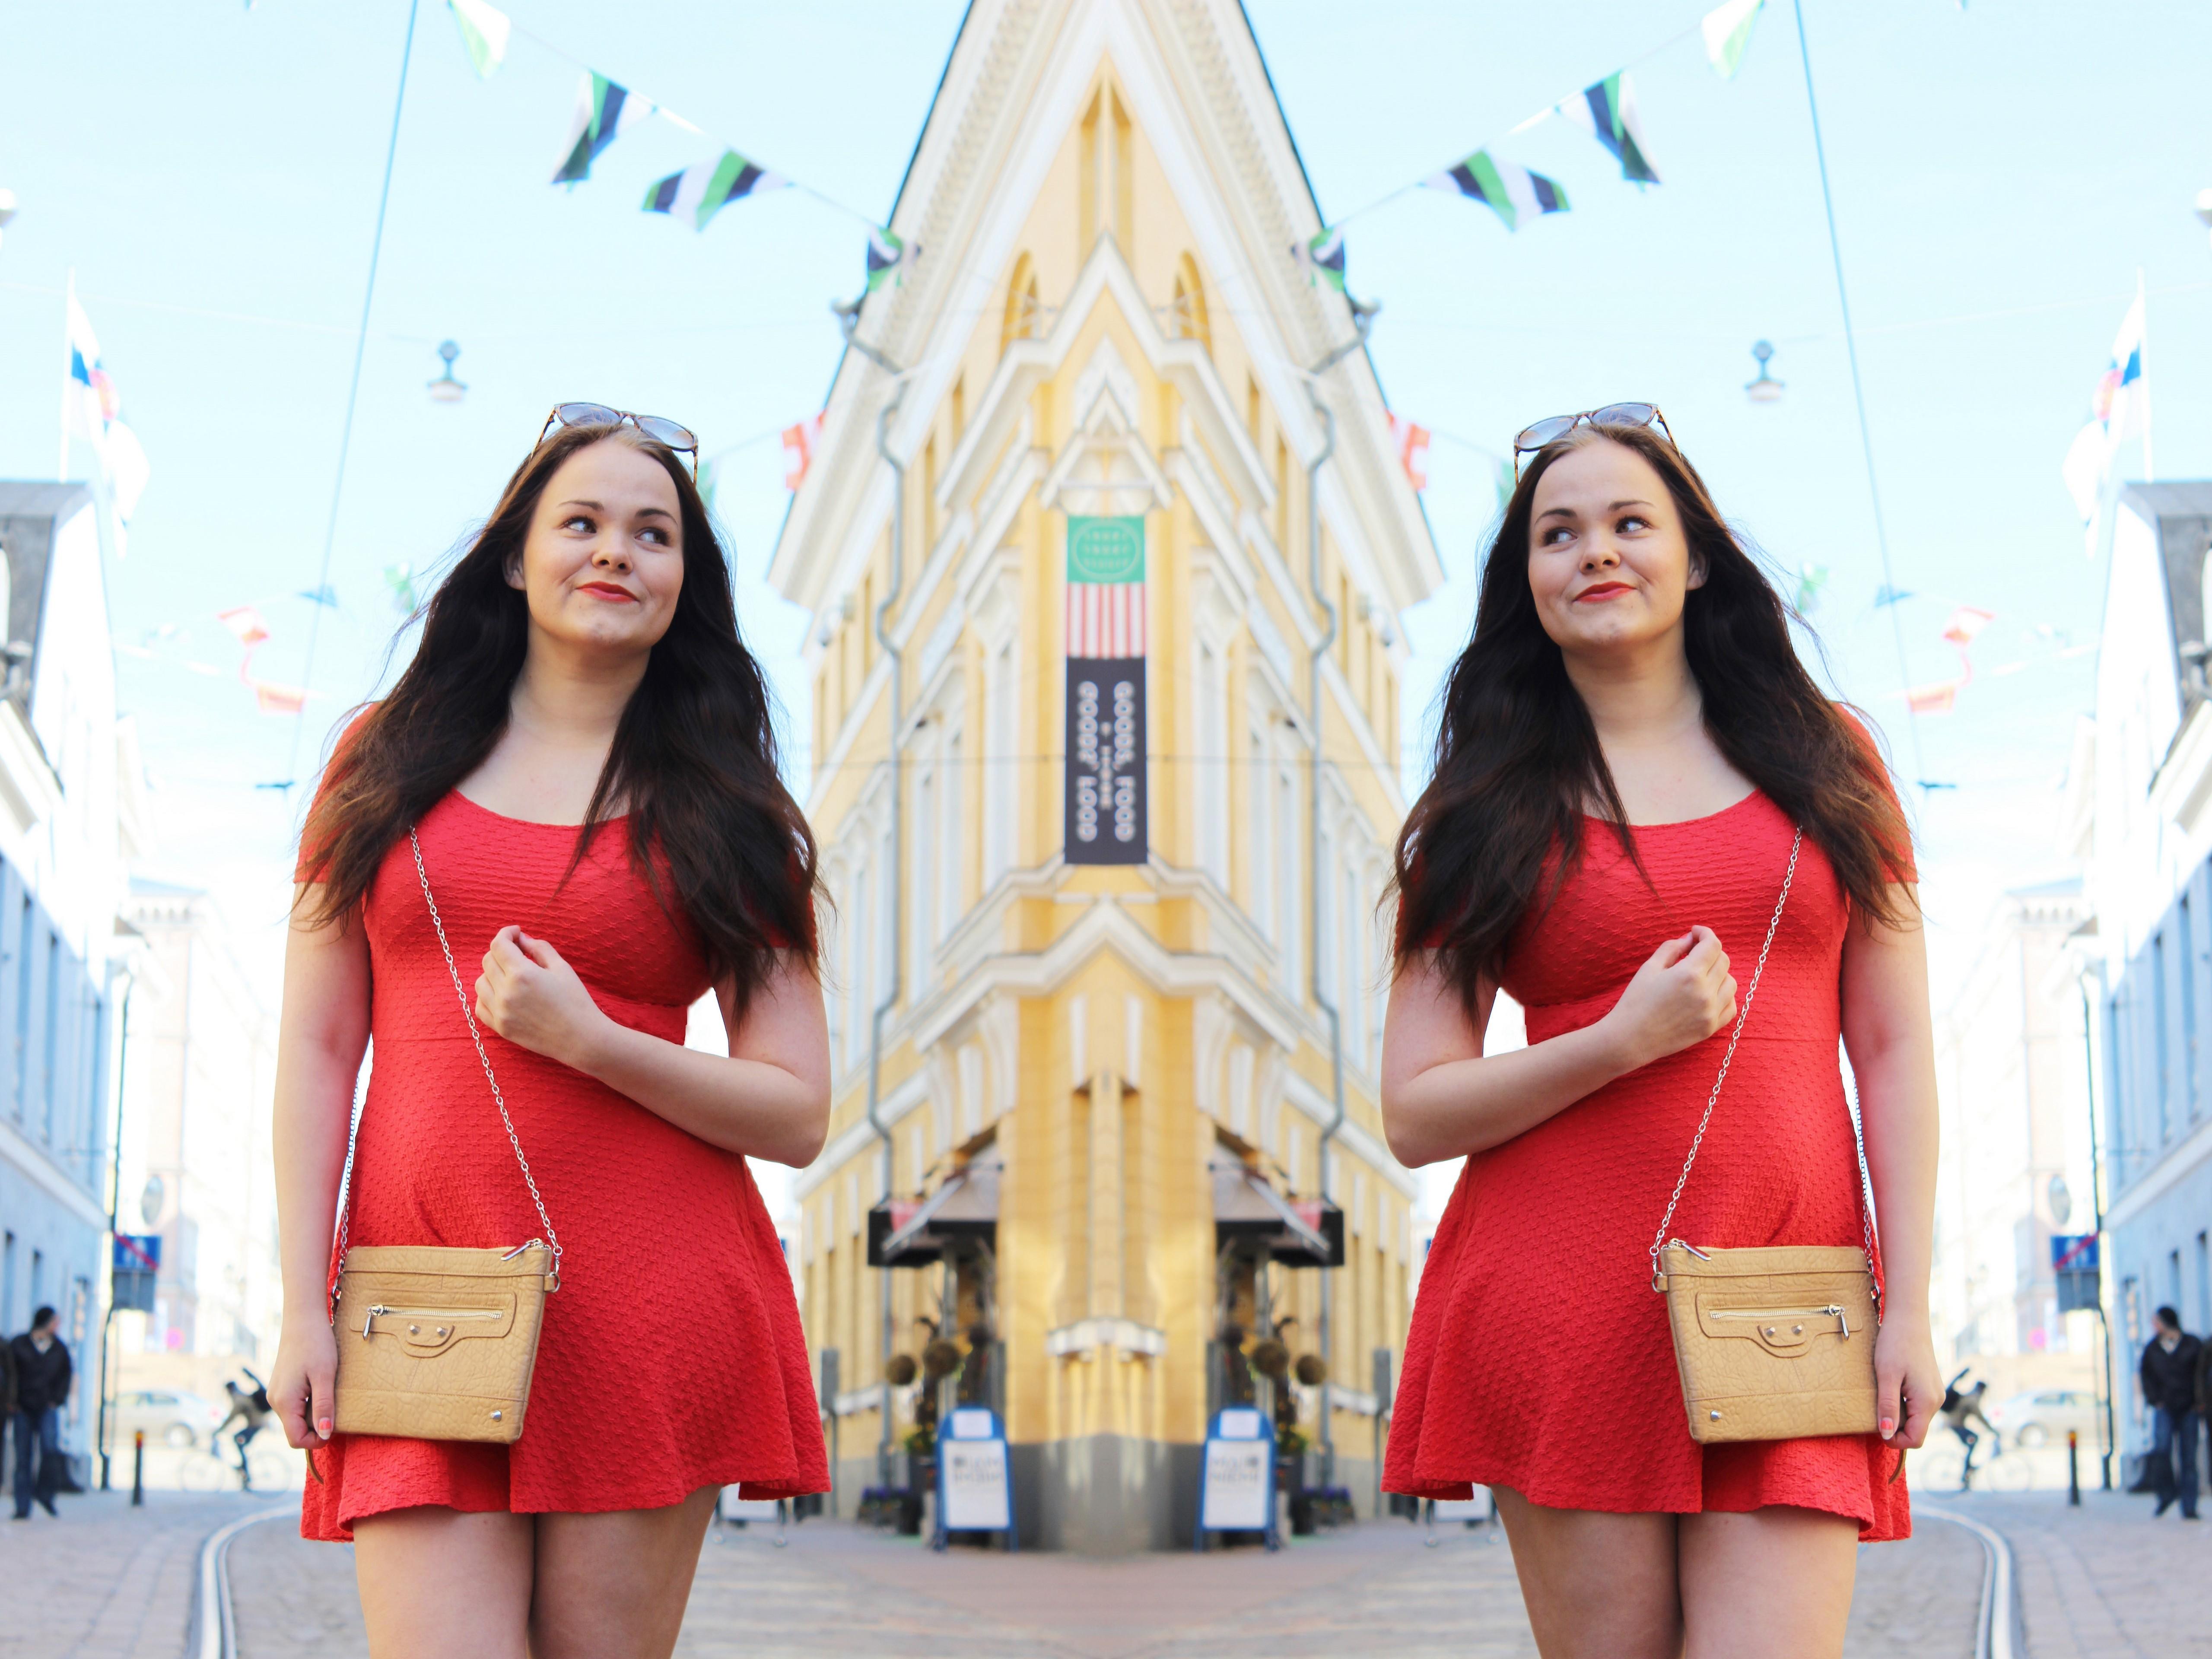 Helsinki photoshoot10